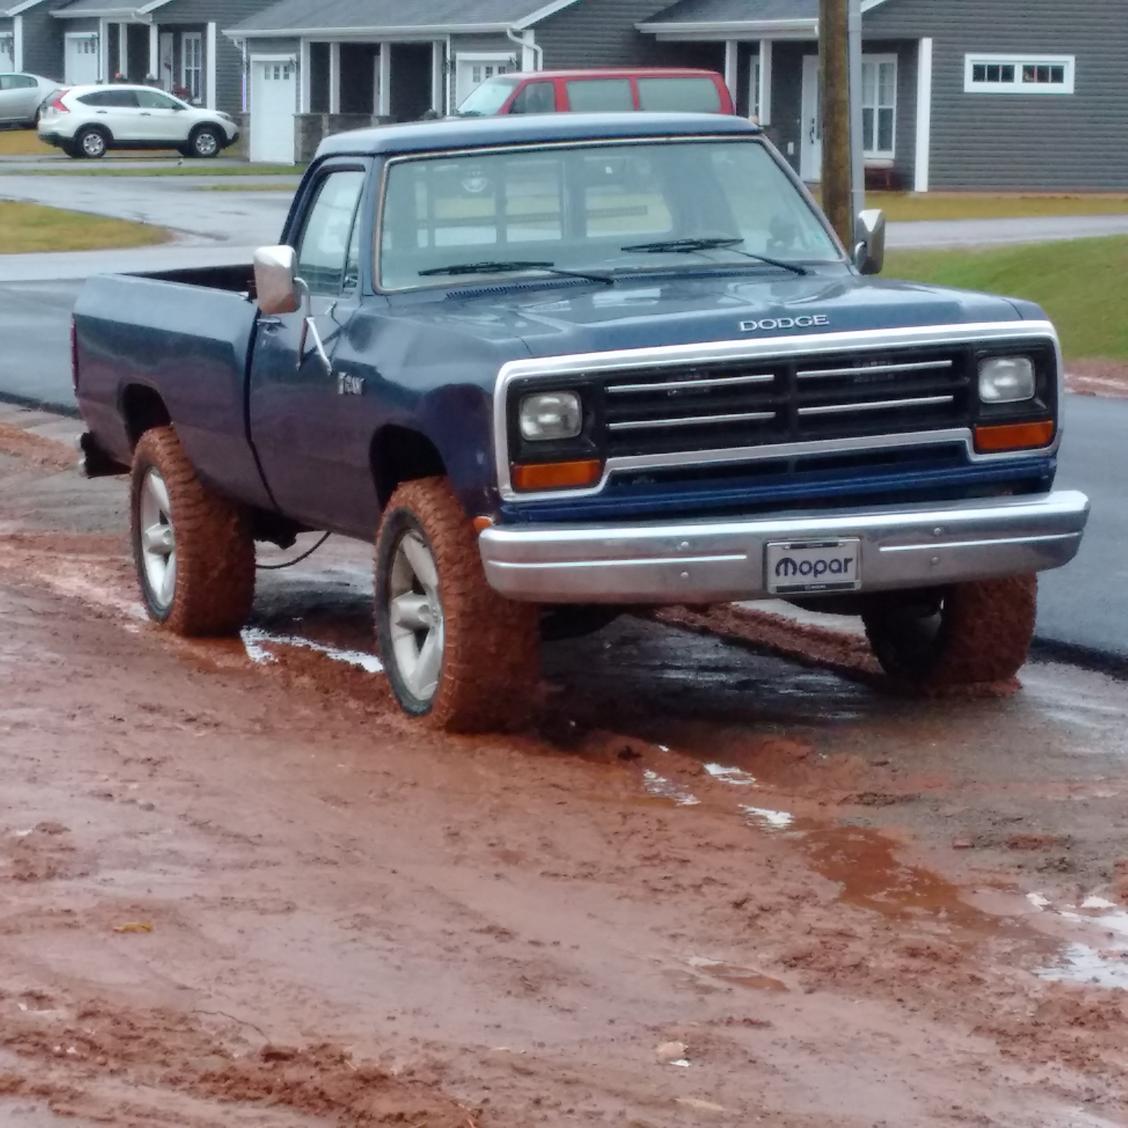 Swap Out Carb D 318 Swap In 5 7 Hemi Dodge Ram Forum